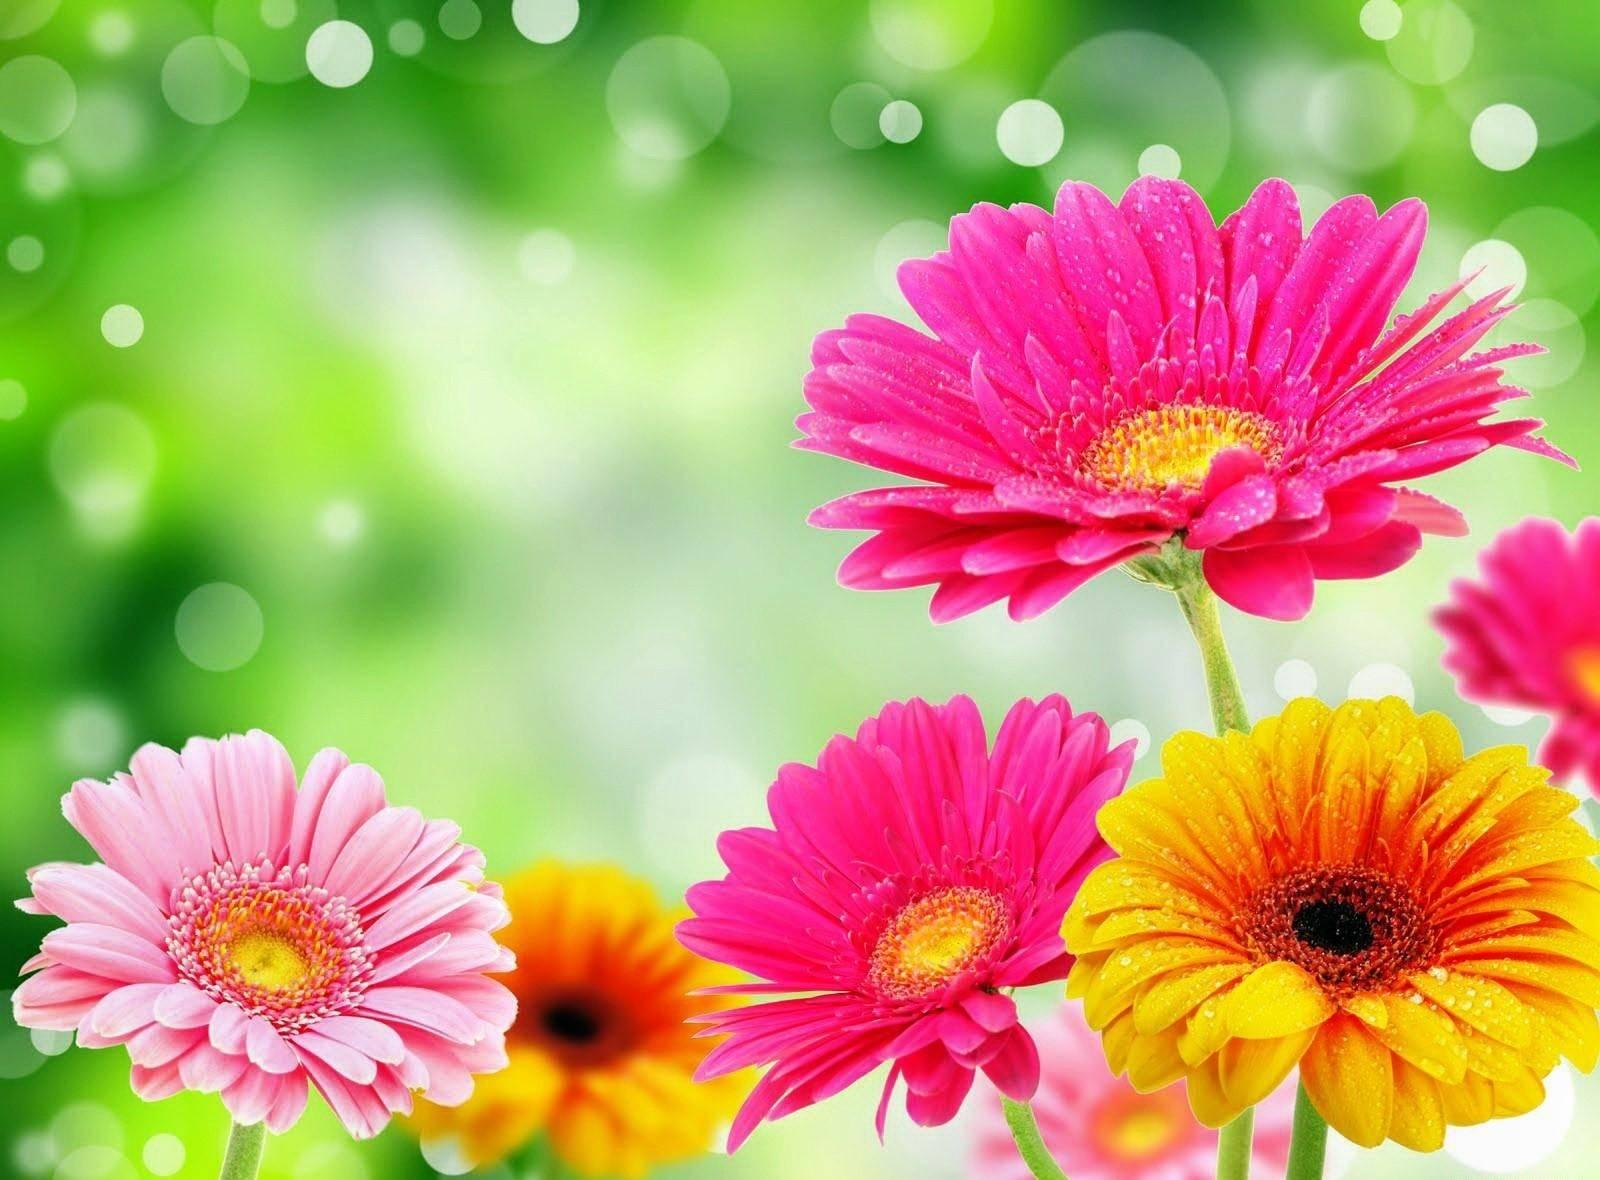 Цветы на весь экран андроид